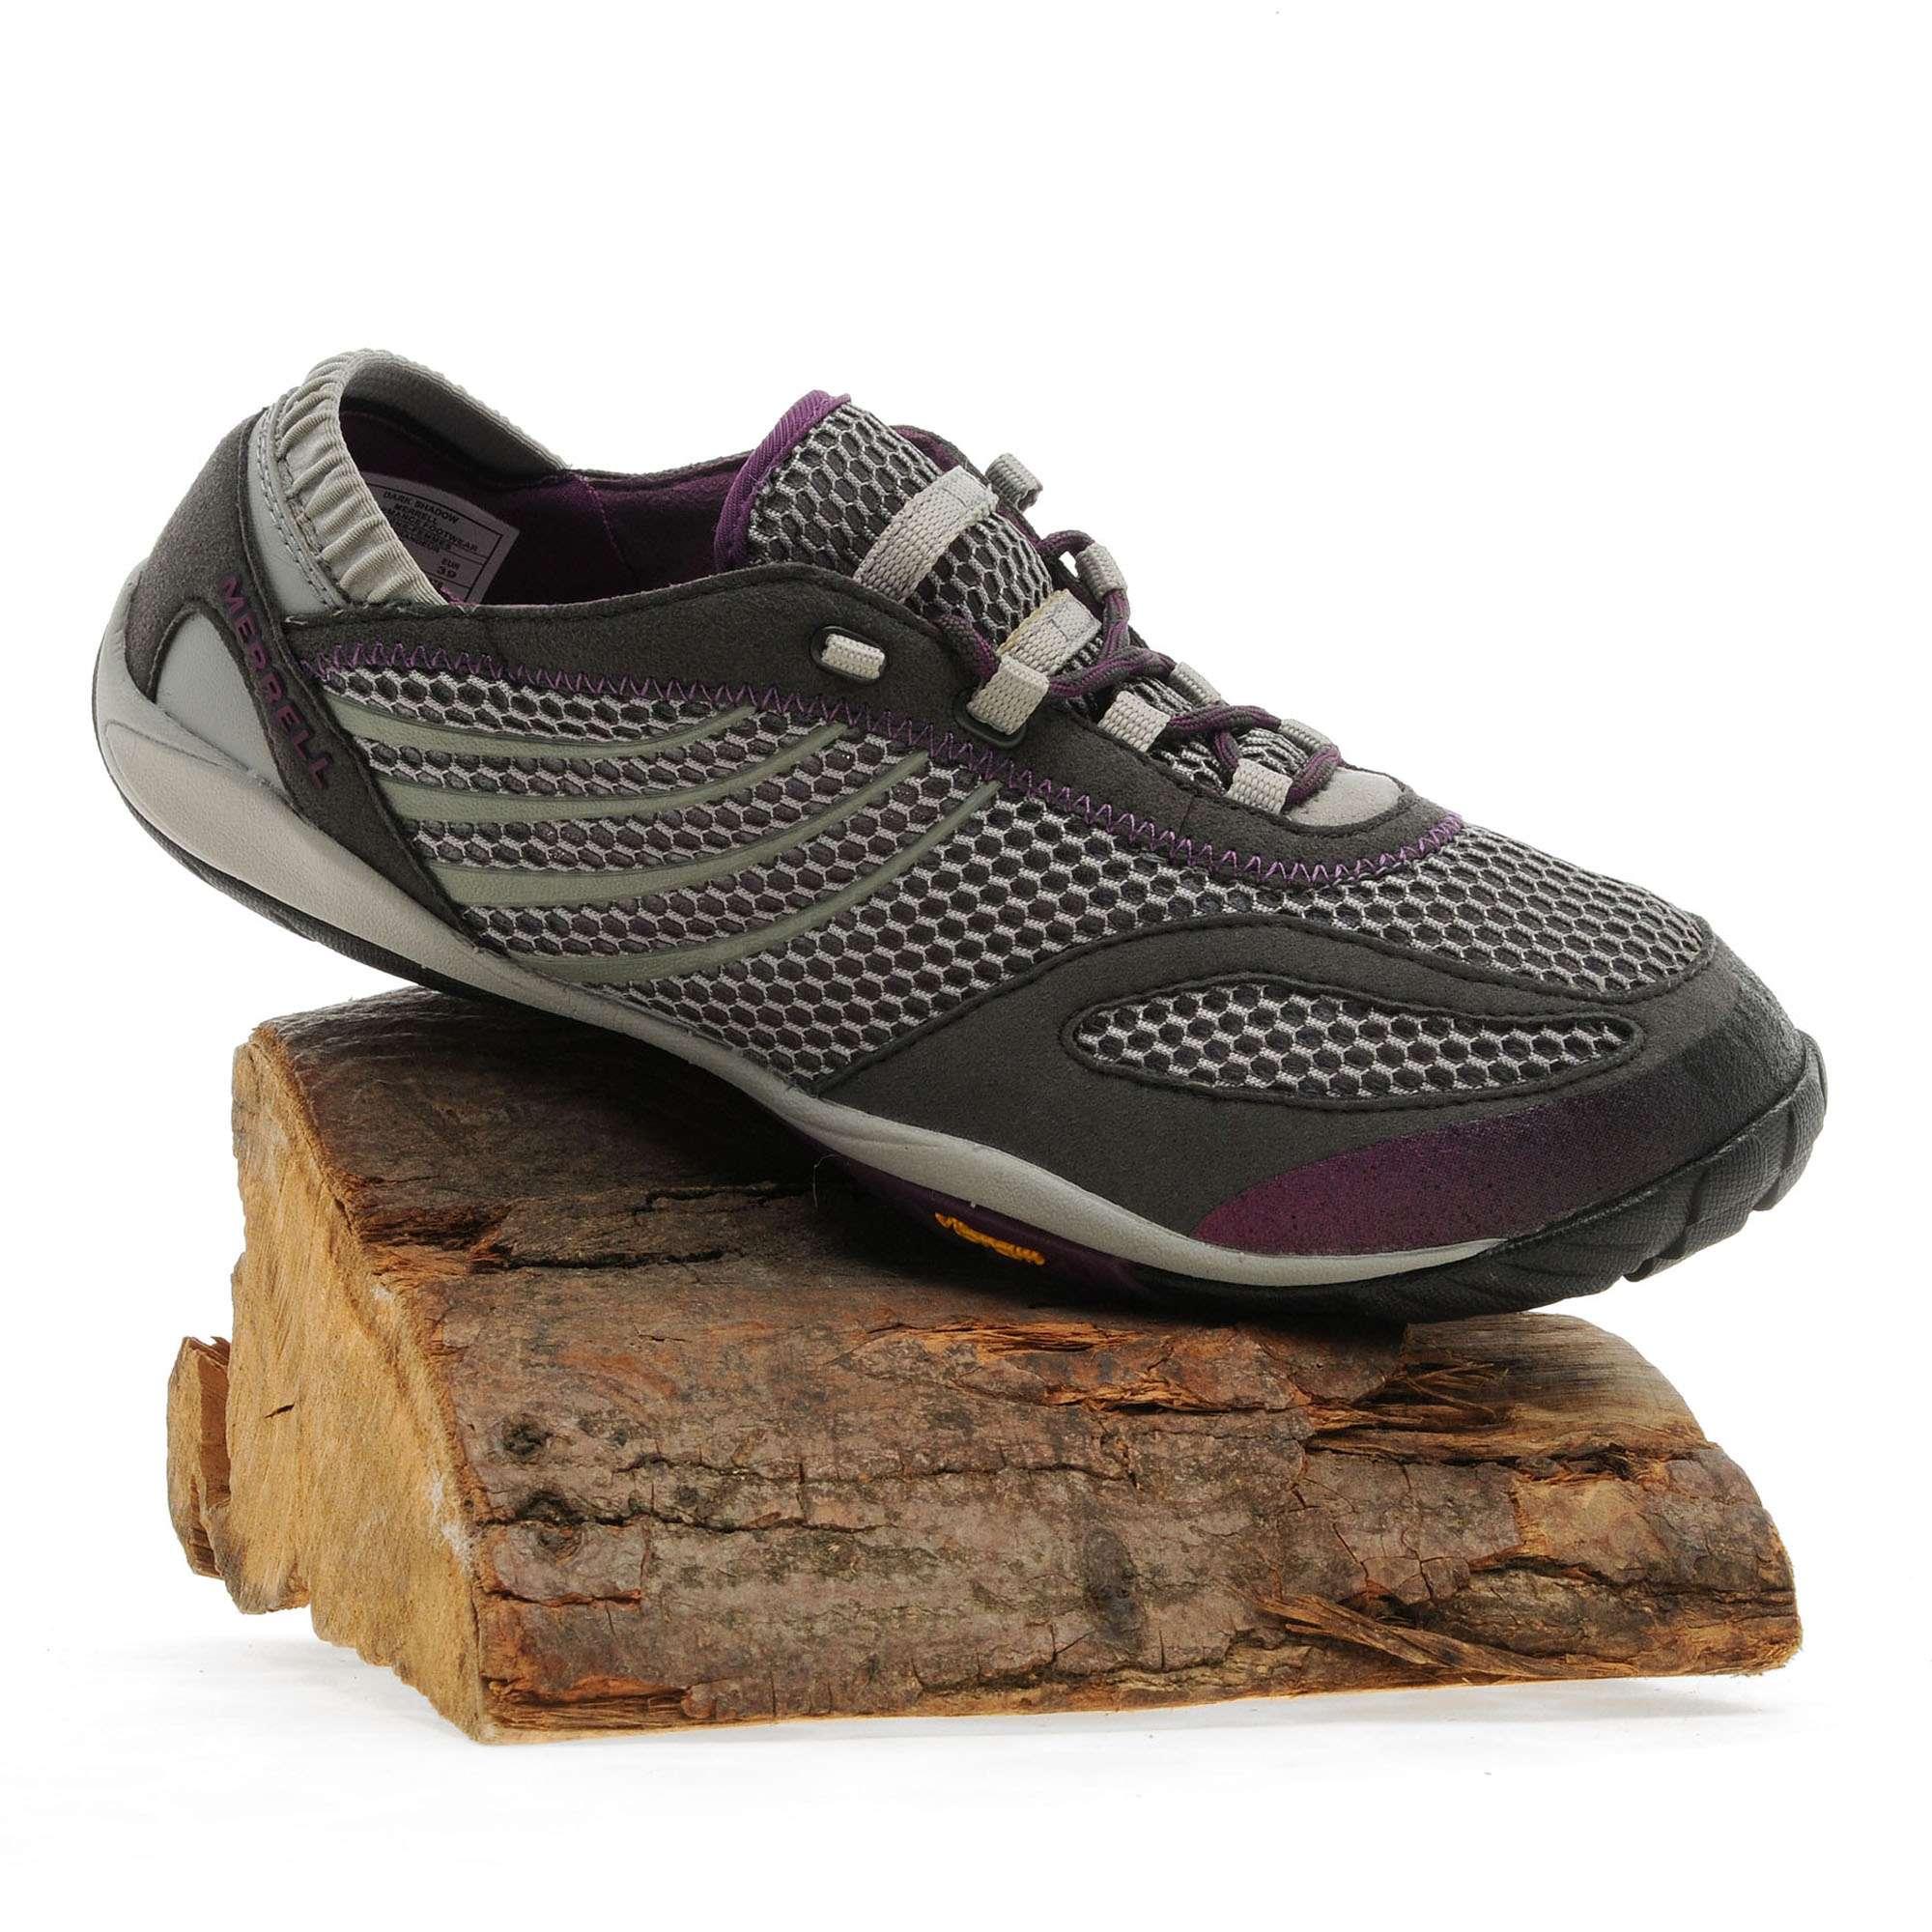 MERRELL Women's Pace Glove Barefoot Multi-Active Shoe